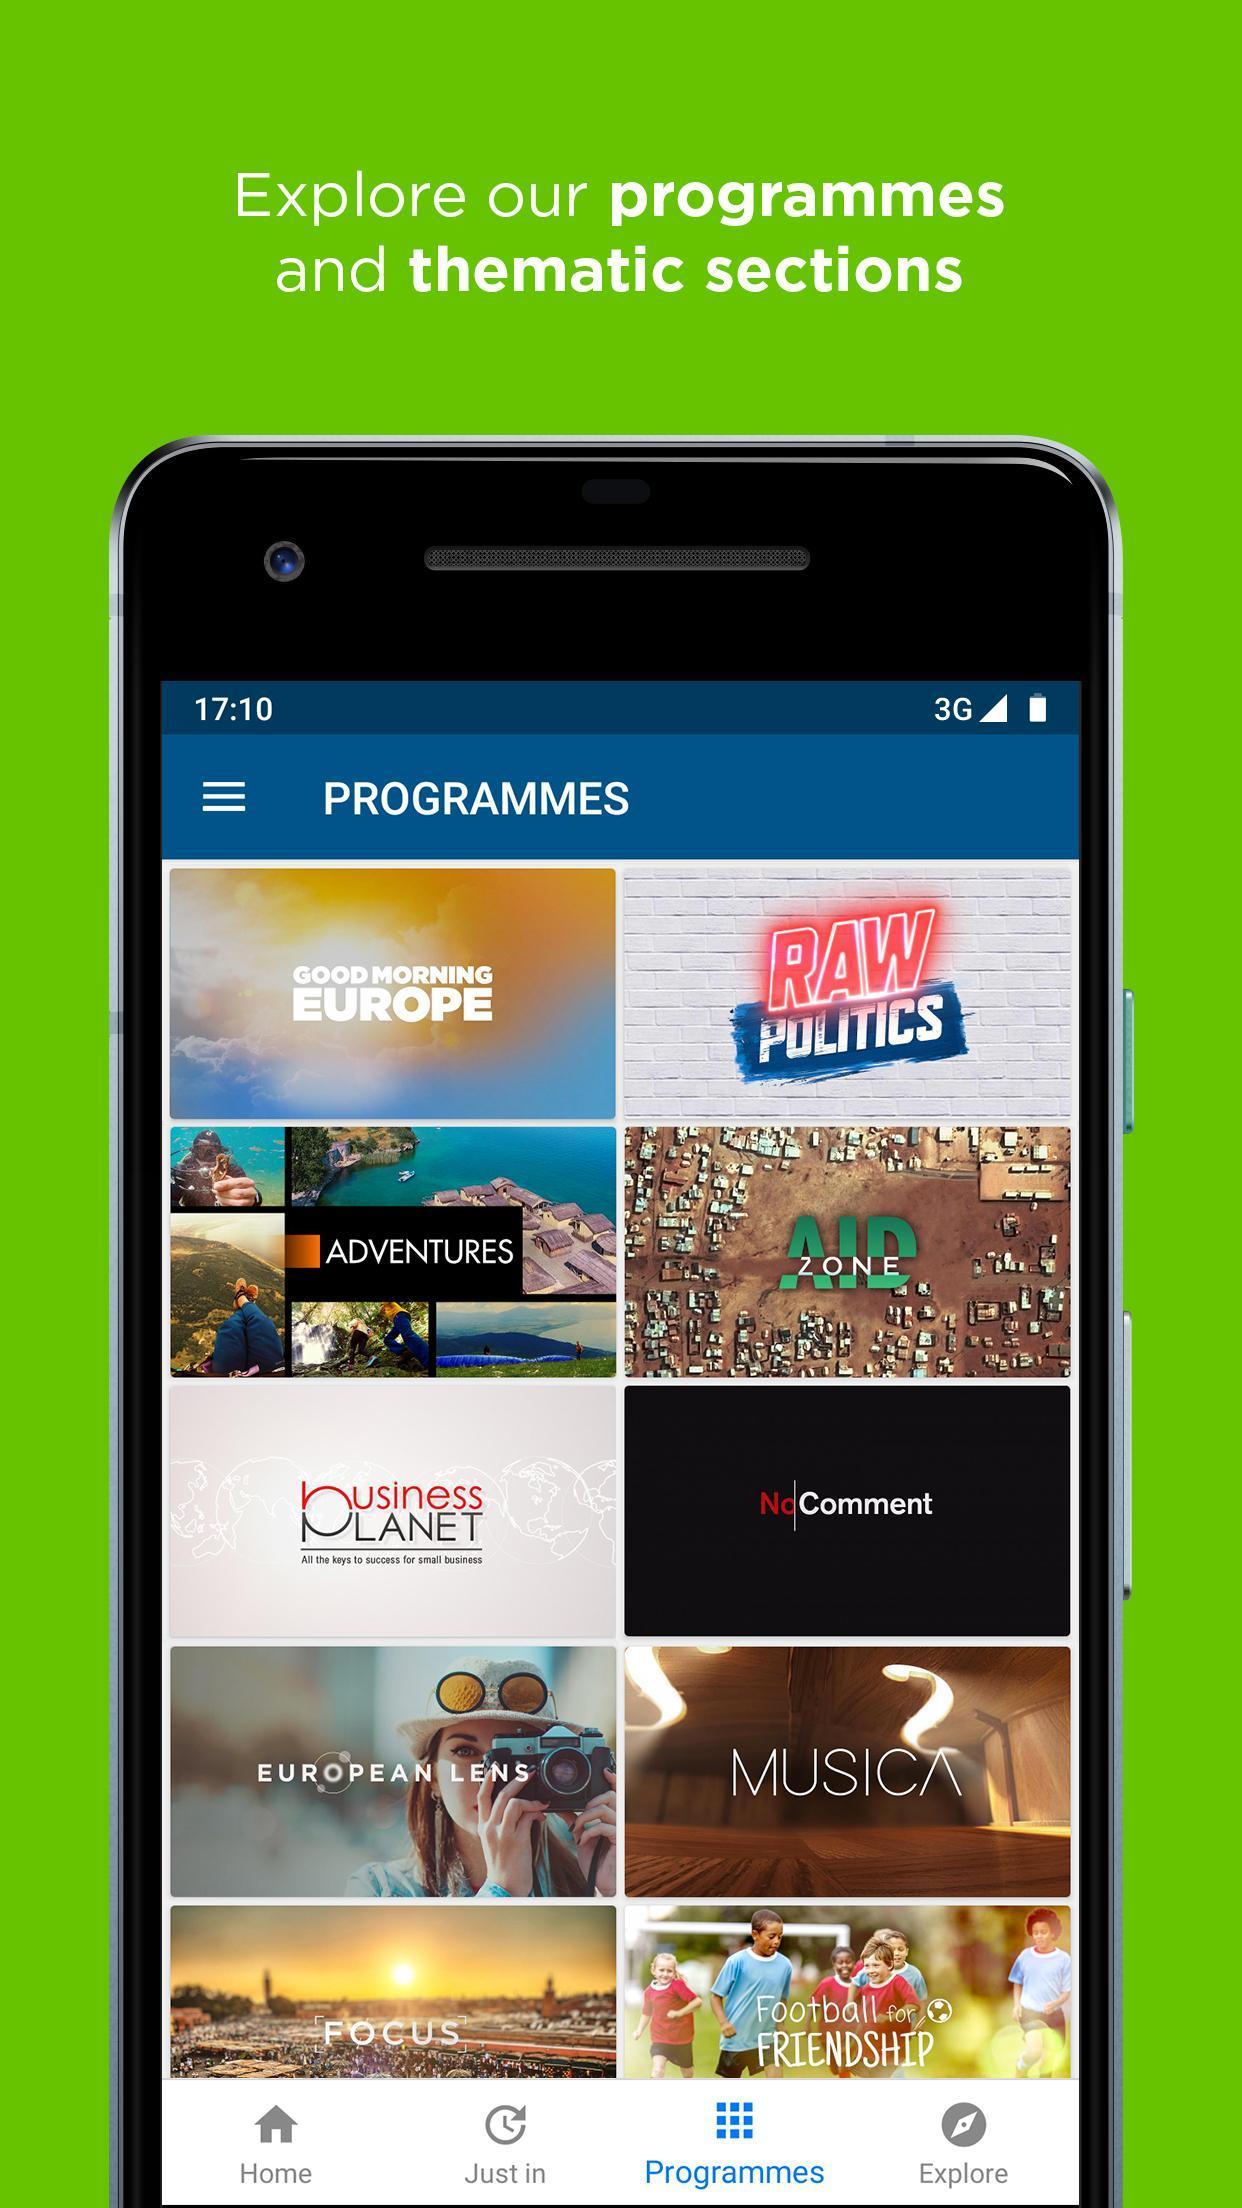 Euronews Daily breaking world news & Live TV 5.2.1 Screenshot 4